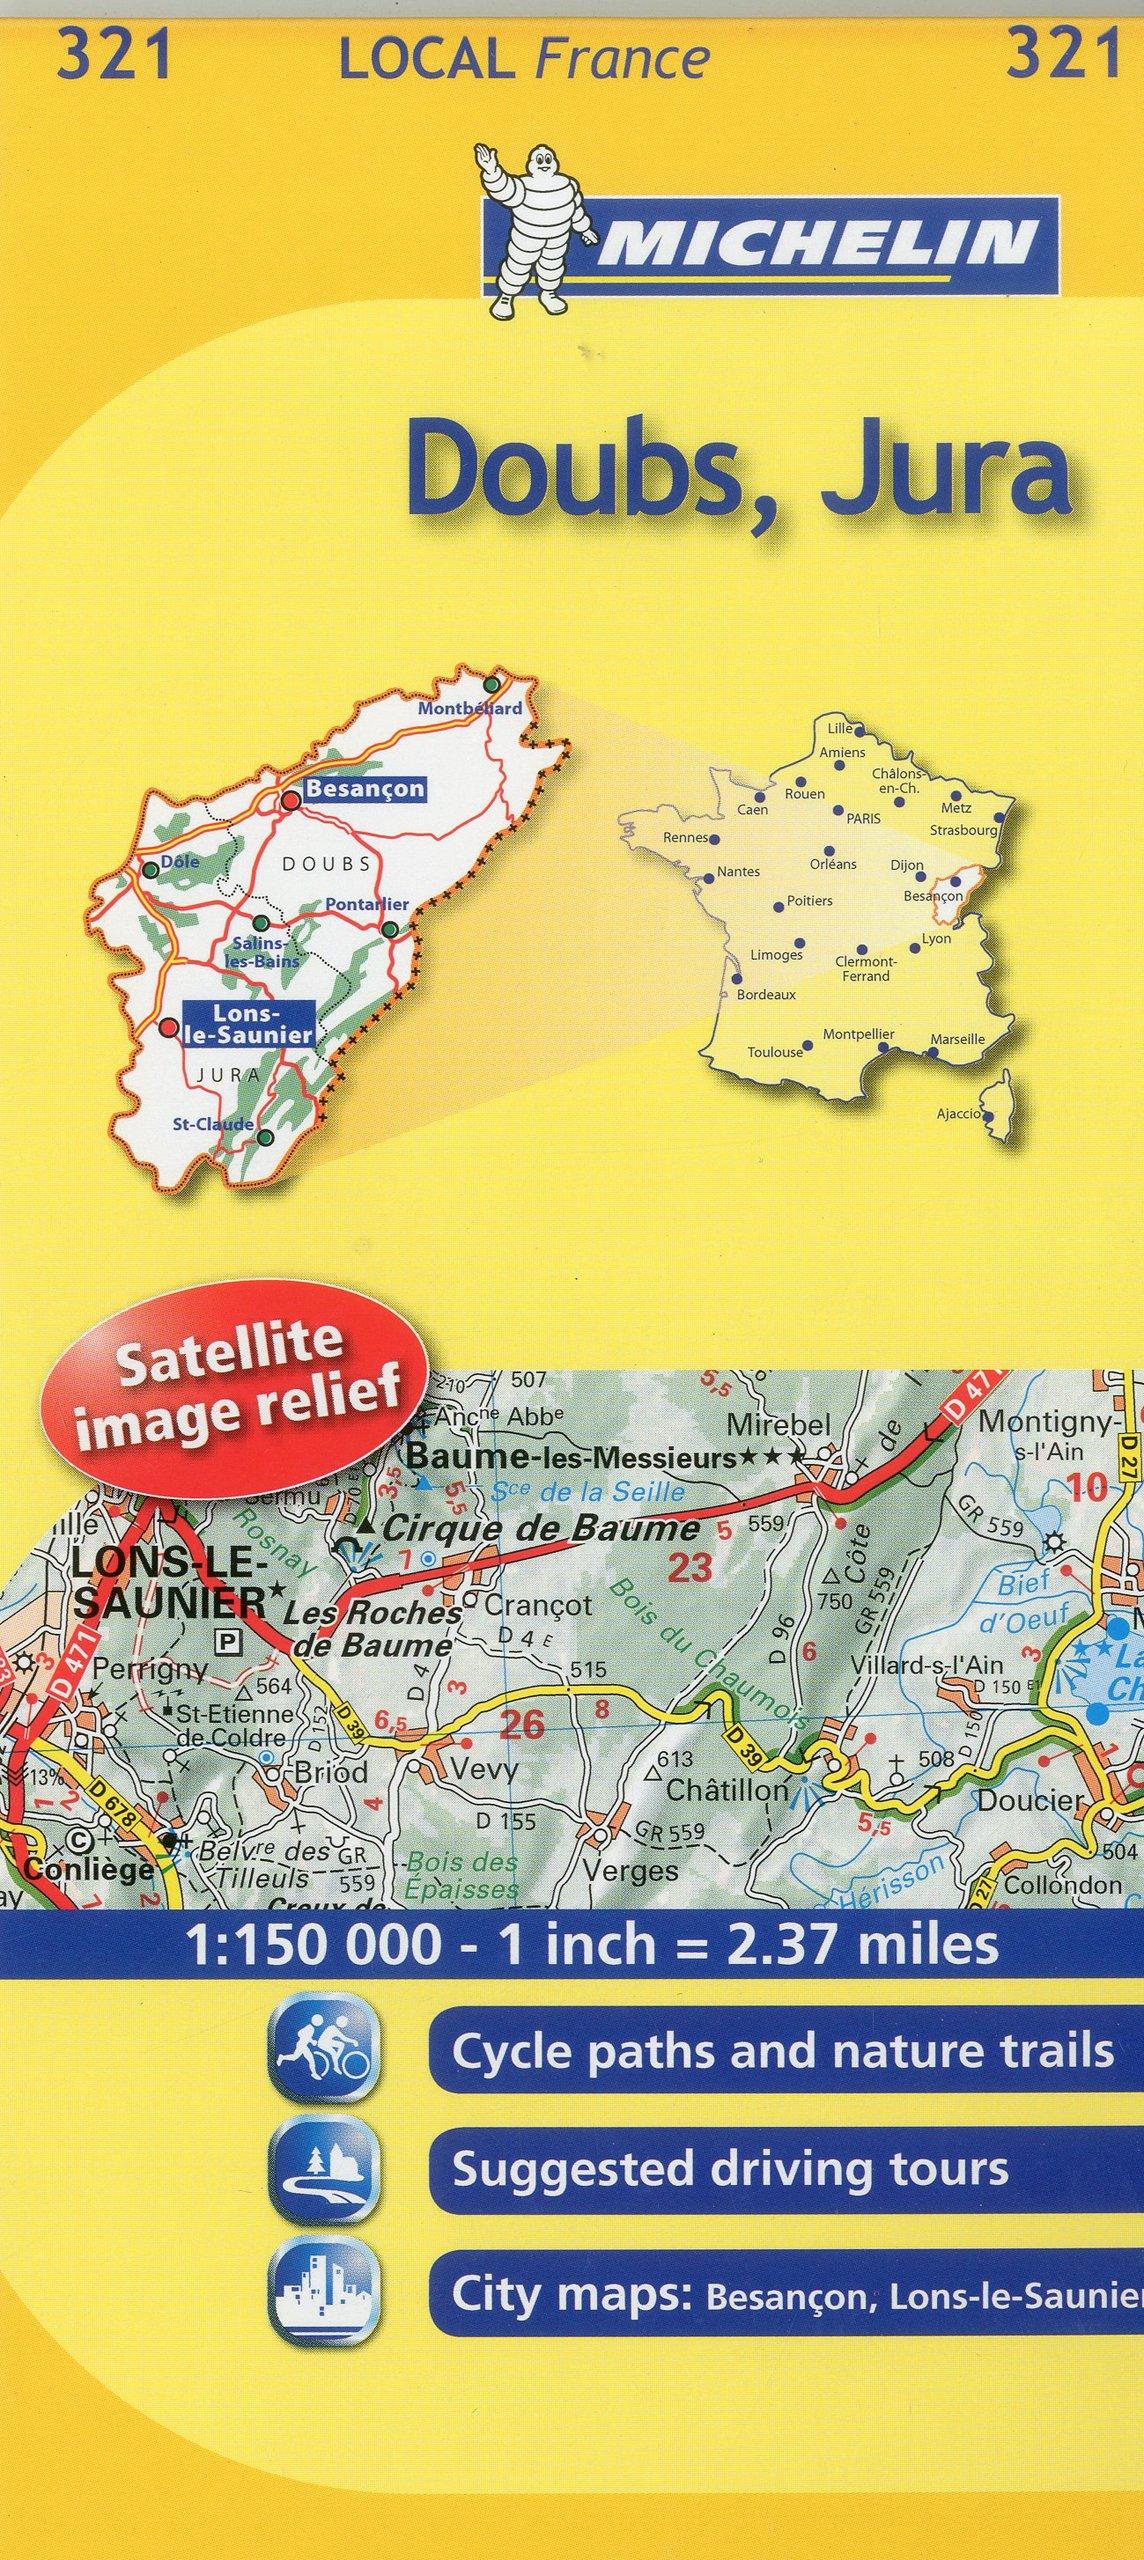 Michelin Map France: Doubs, Jura 321 (Michelin Local Maps)